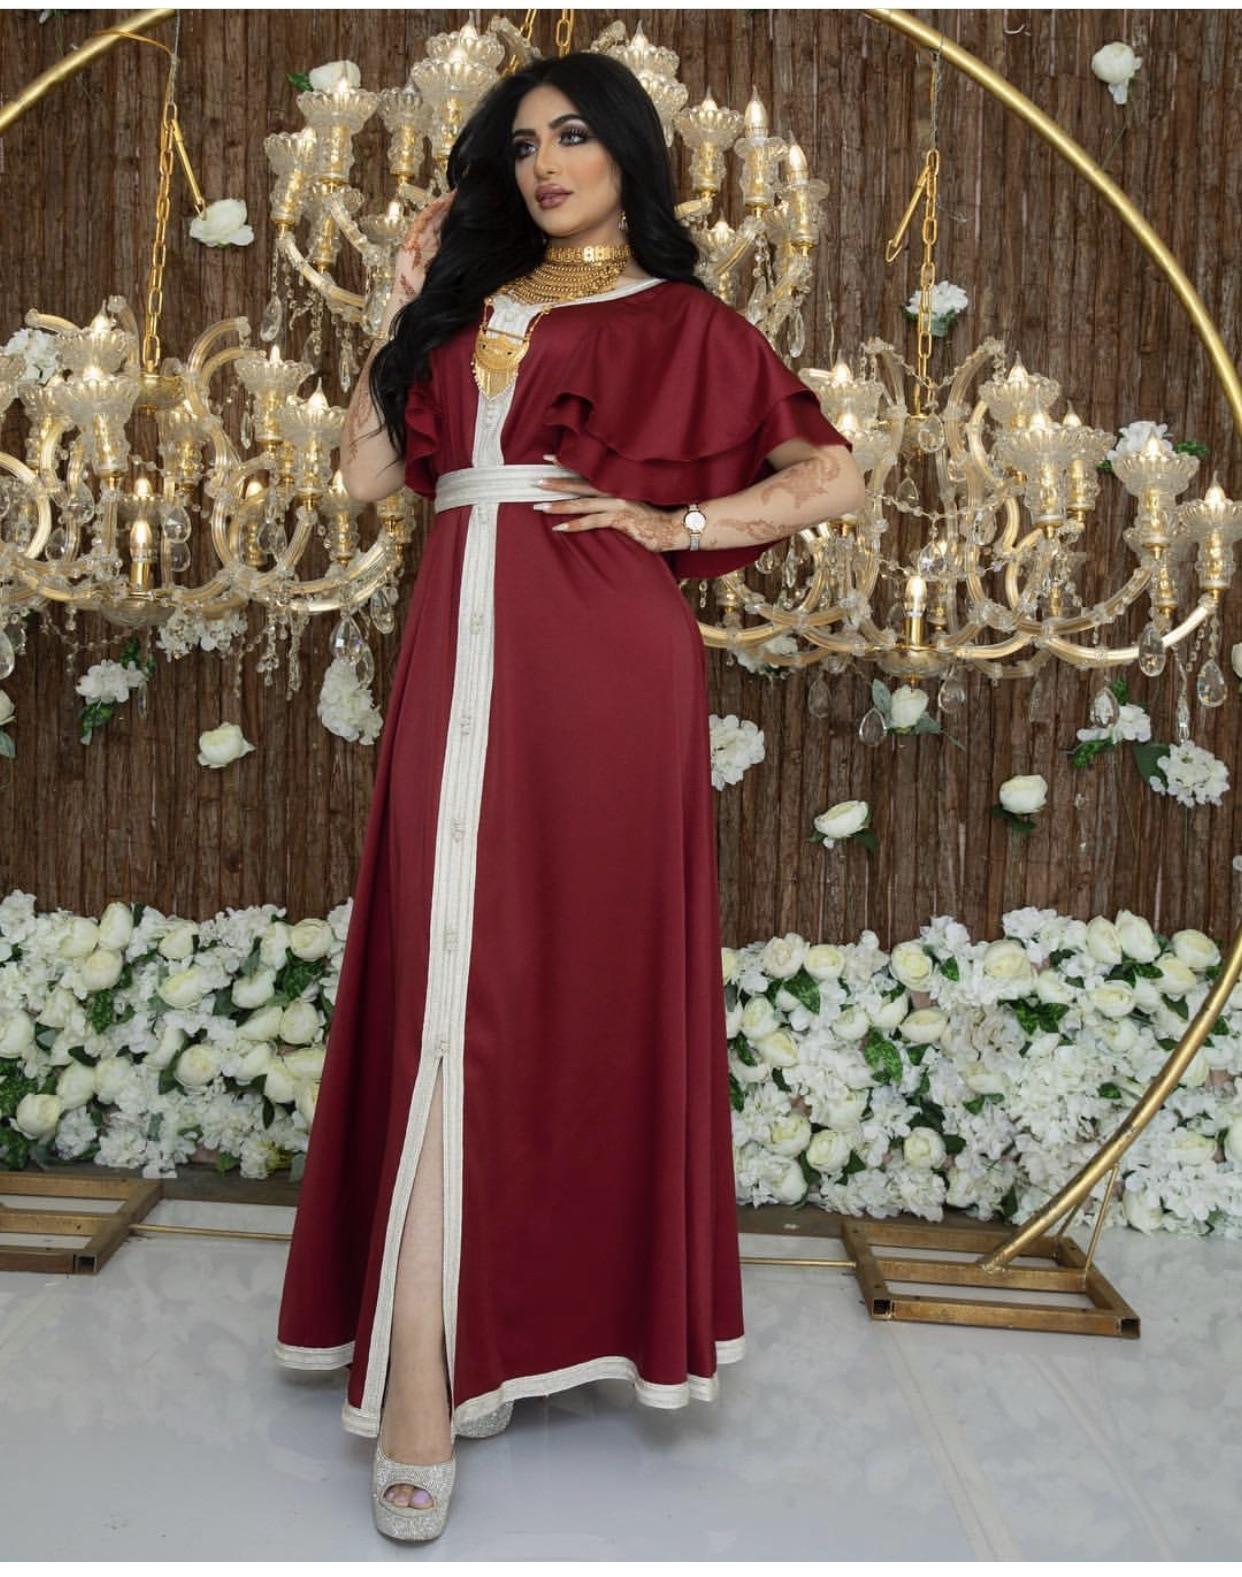 Muslim Women Abaya Dubai Lace Robe Ruffle Sleeve Dress